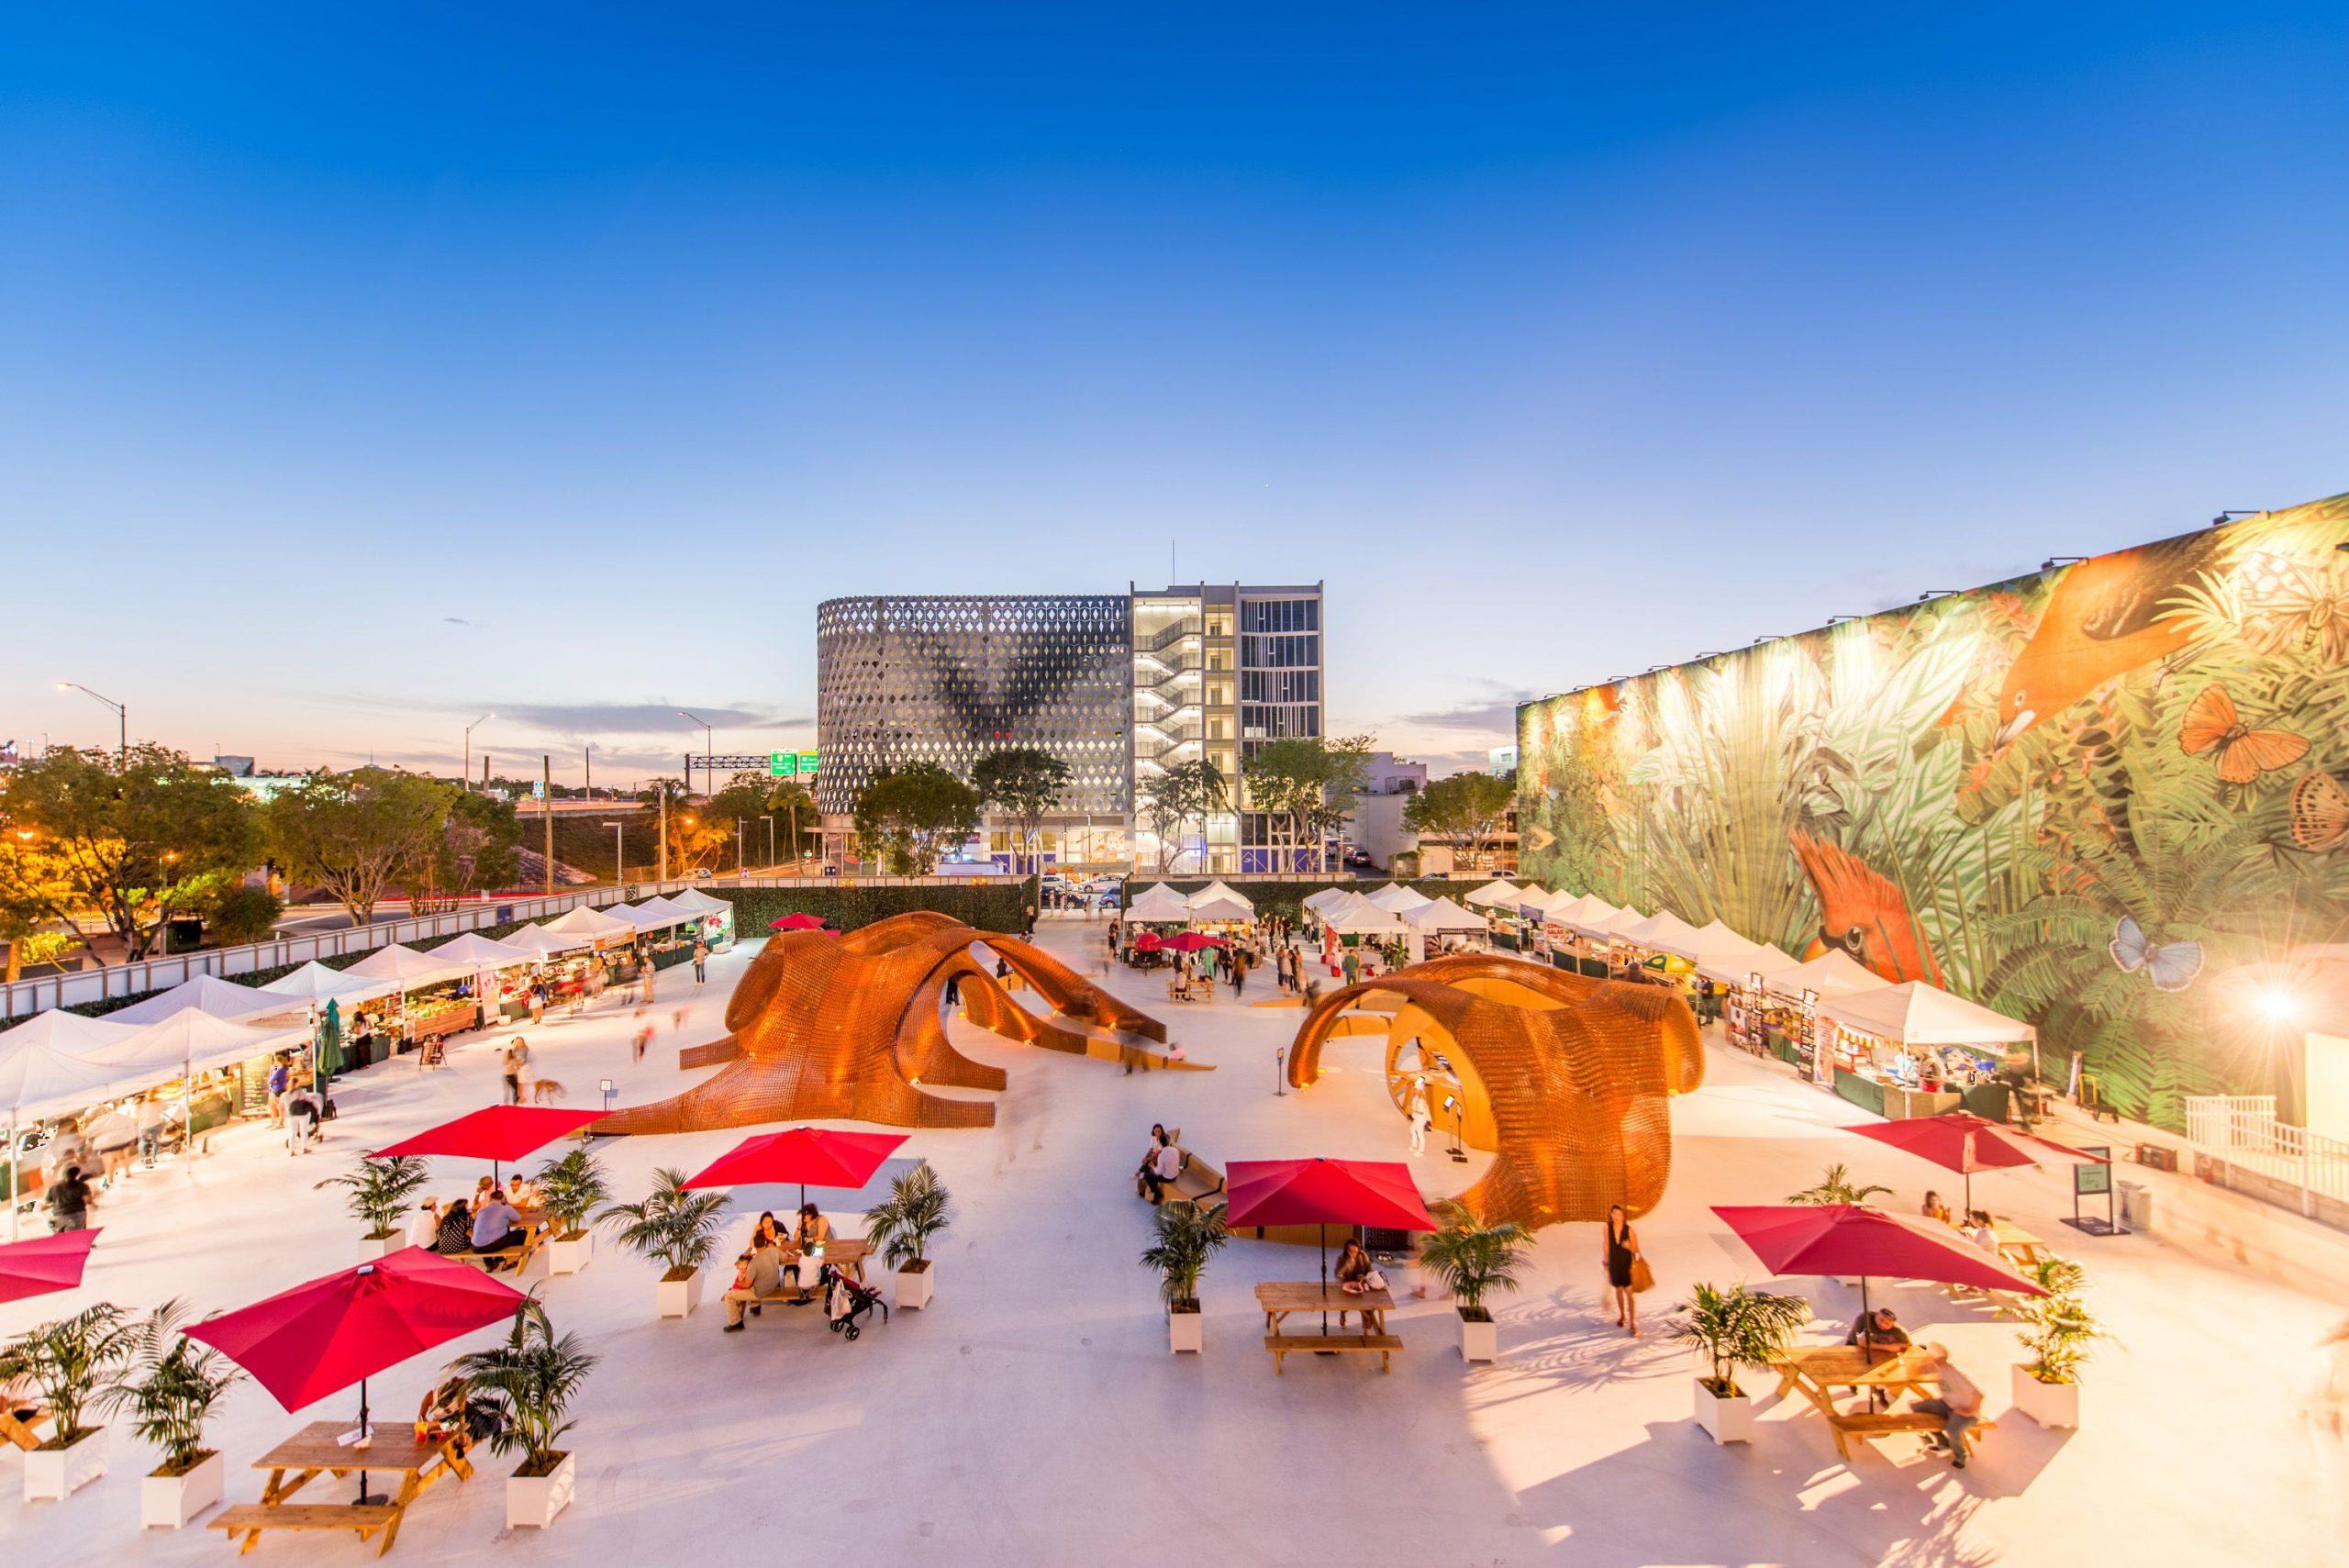 Miami Design District teams up with Florida Fresh Markets